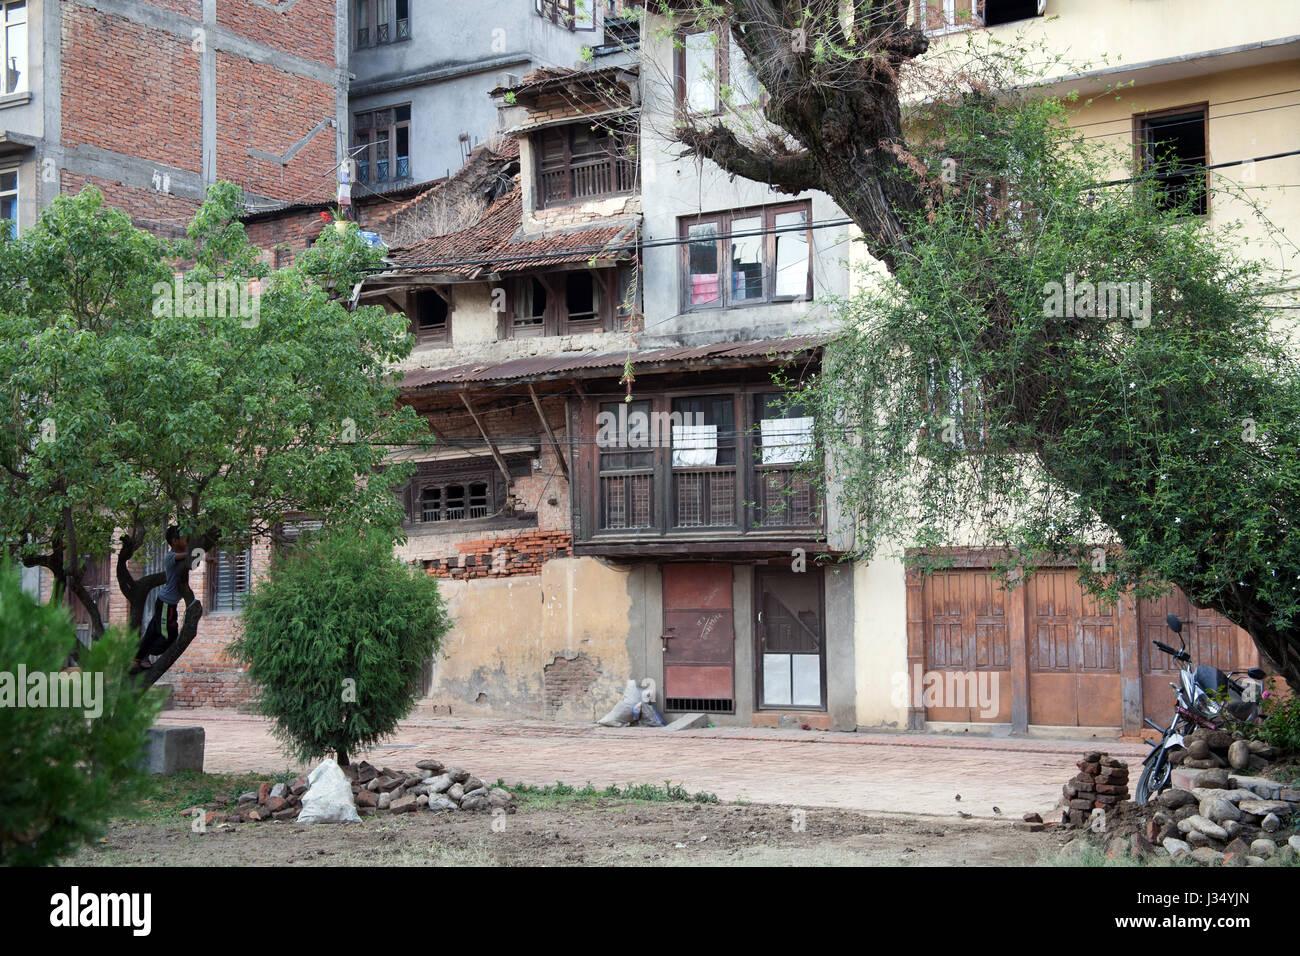 Ramshackle buildings in a square in Patan, Kathmandu, Nepal - Stock Image